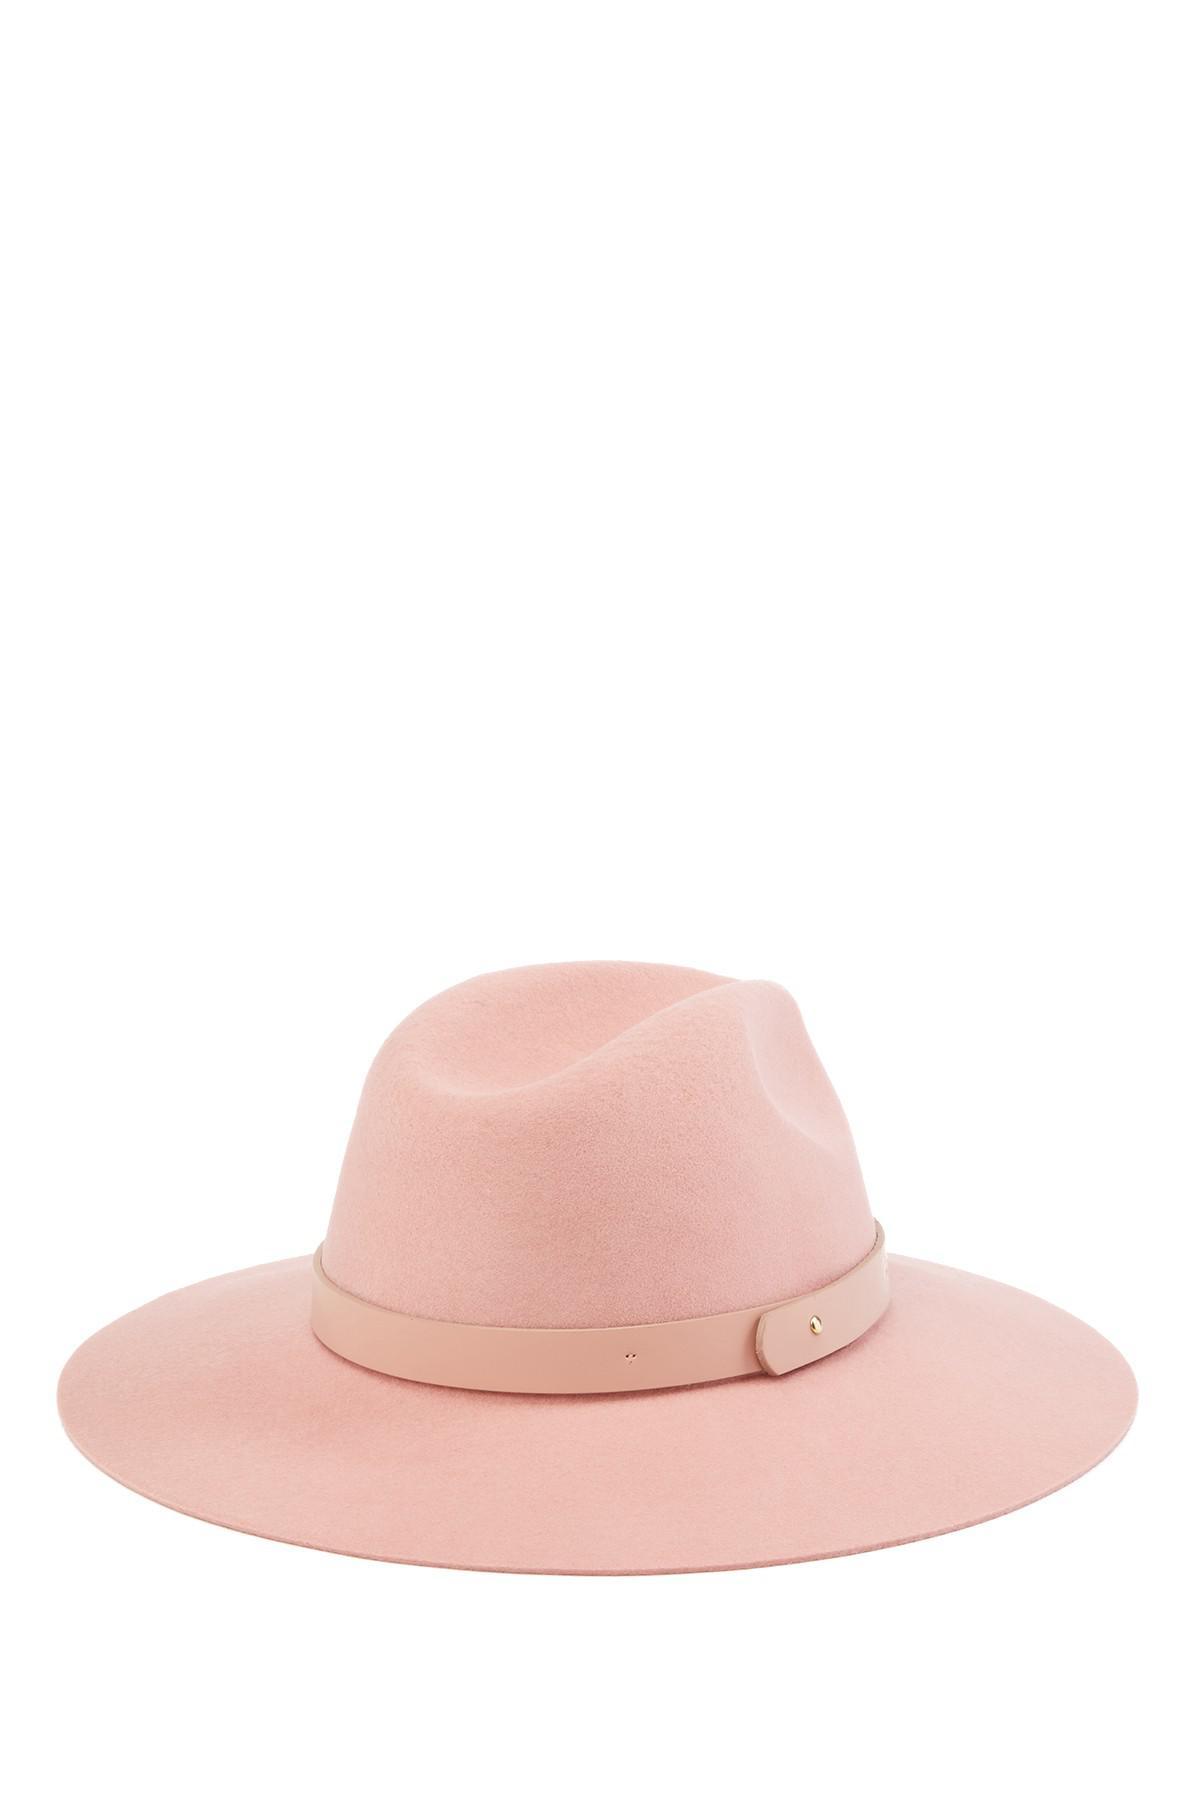 767c342cd Phenix Pink Leather Band Fedora